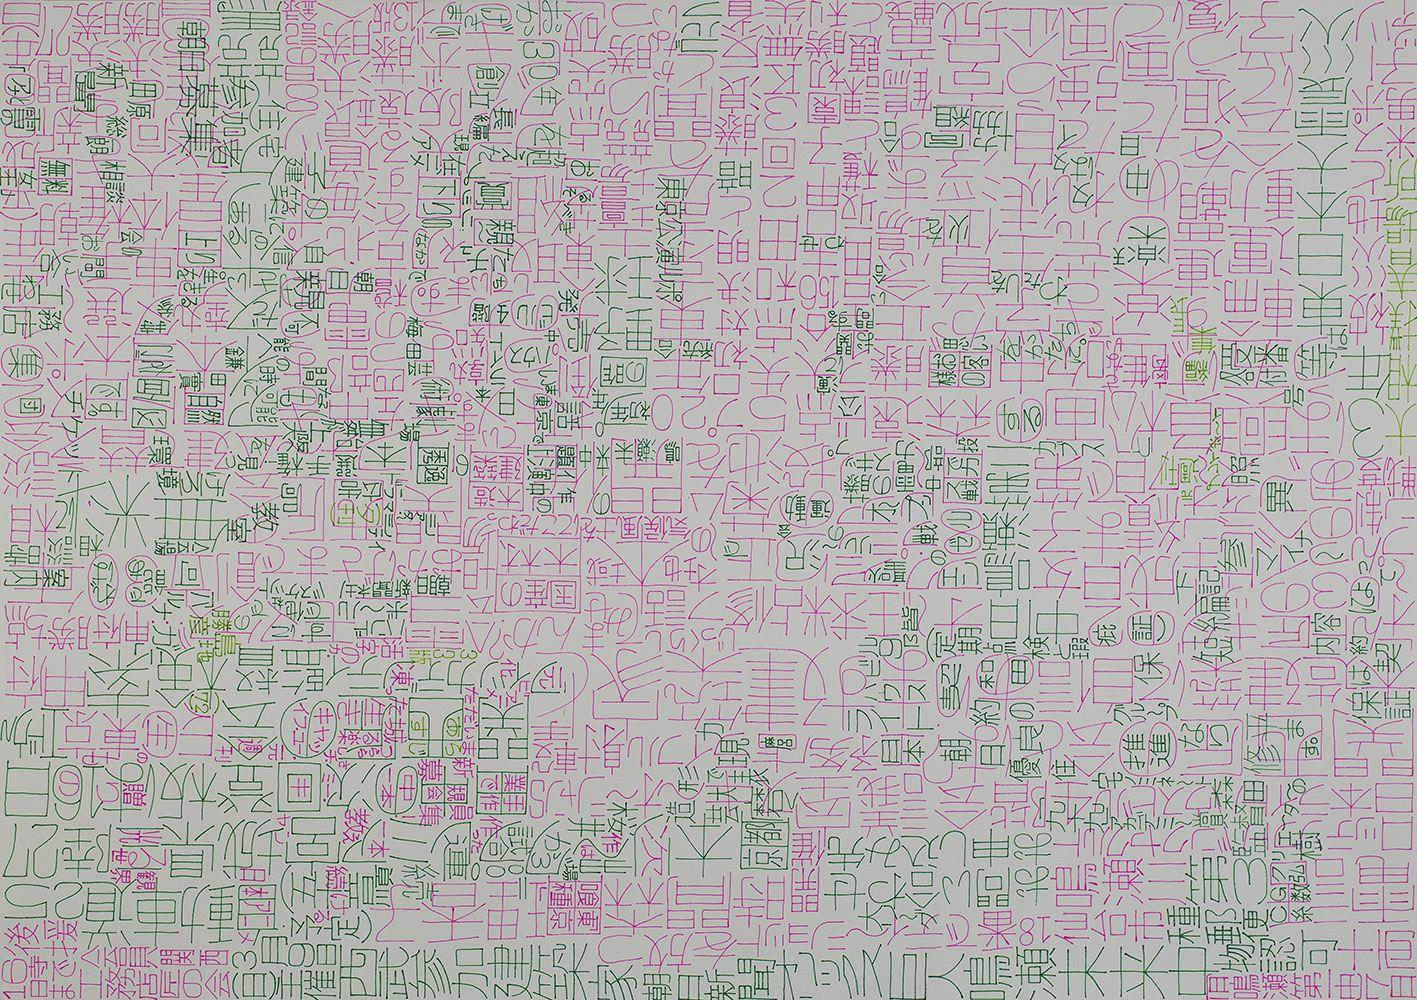 Yoshiyasu Hirano    Untitled  , 2015 Ink on paper 21.5 x 30 inches 54.6 x 76.2 cm YHi 2